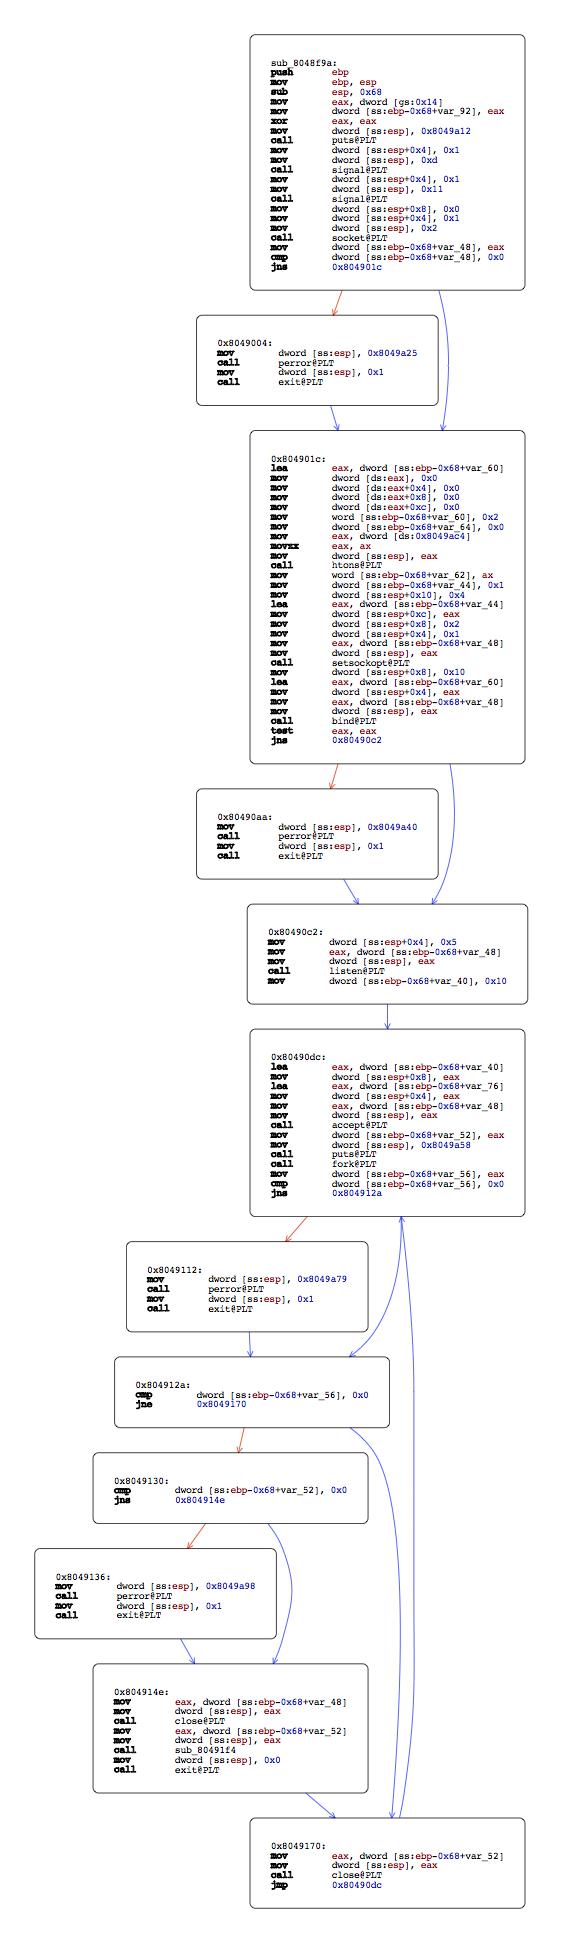 Static analysis of CySCA 2014 portknock using Hopper